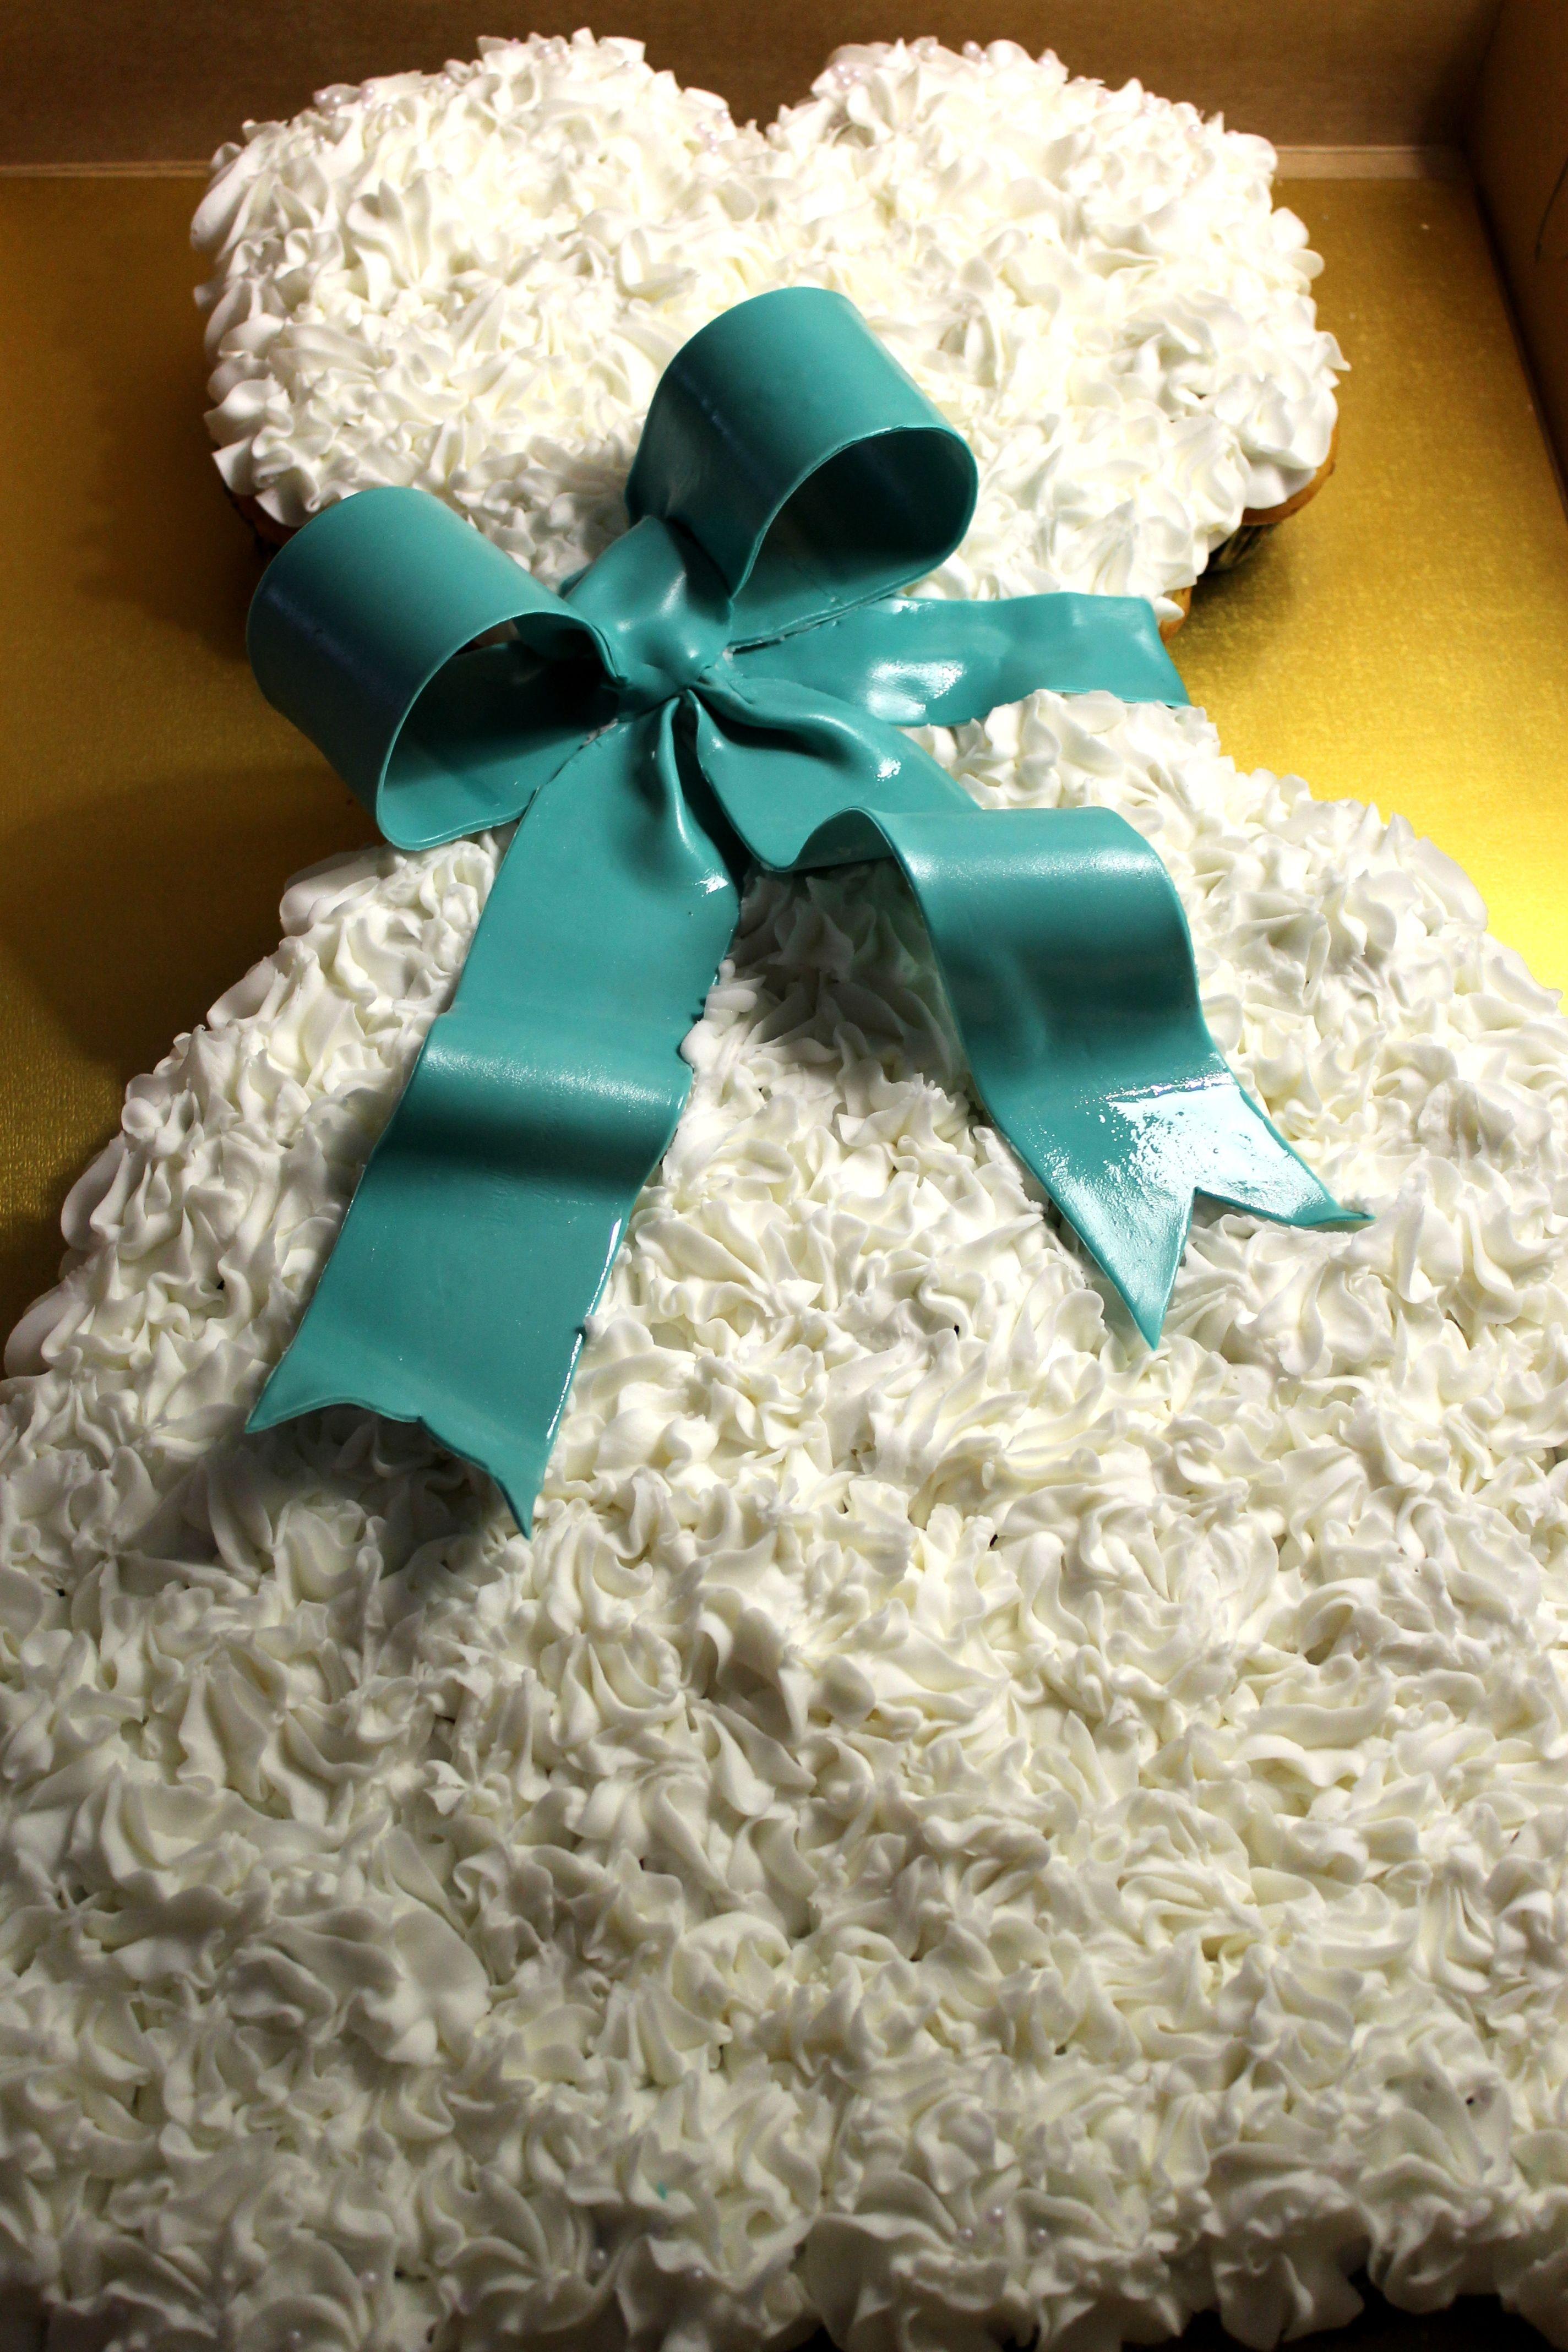 Wedding Wedding Dress Cupcake Cake watch more like wedding dress cupcake cake custom pull a part cupcakes cakes pintere